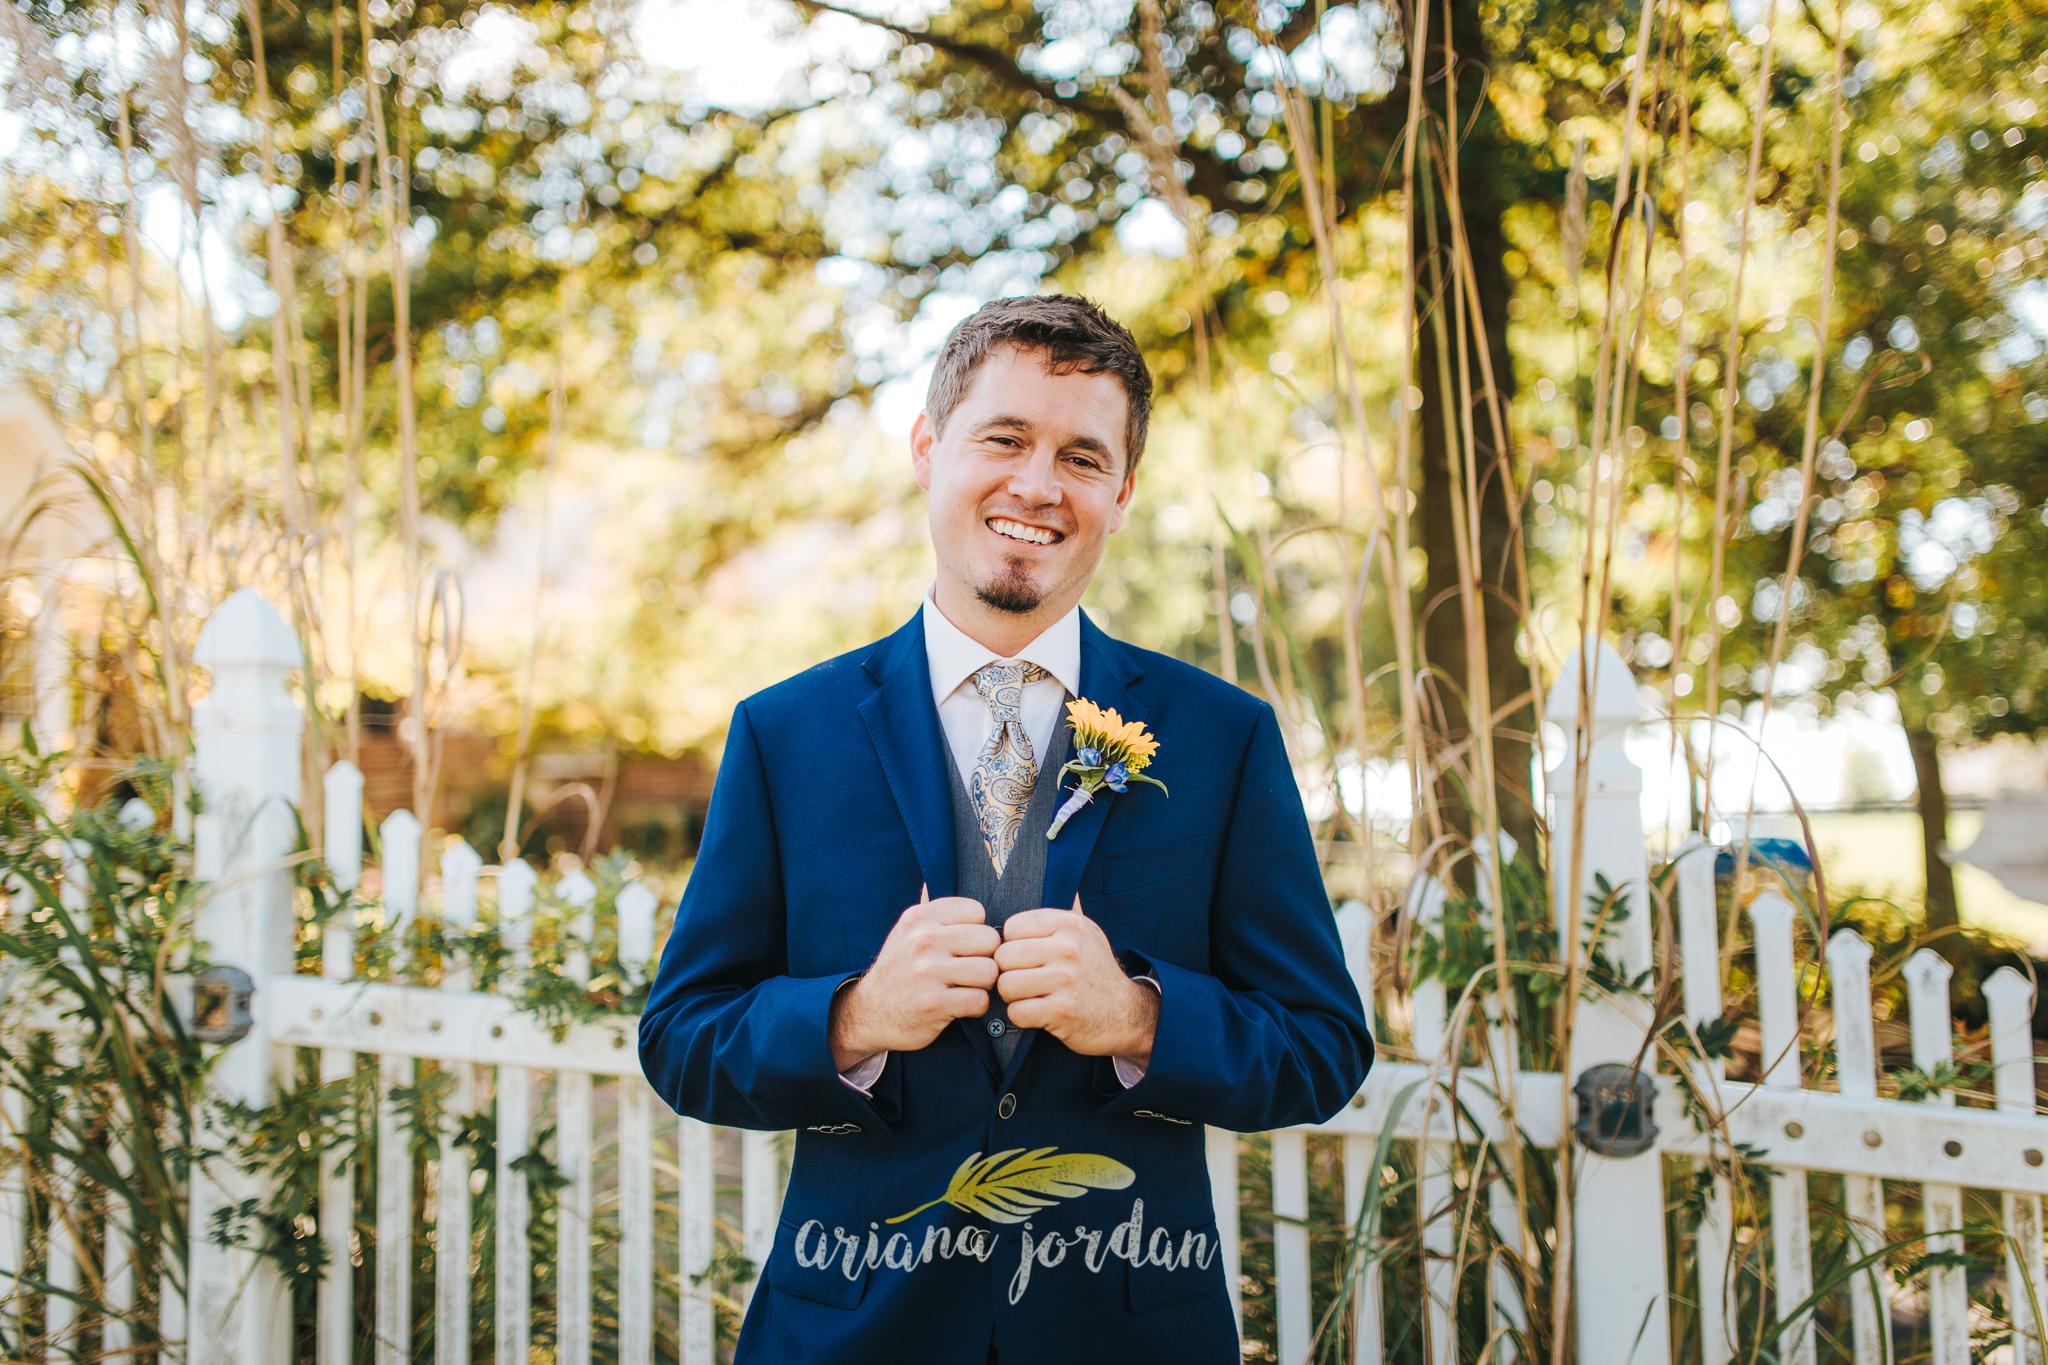 029 Ariana Jordan Photography -Moonlight Fields Lexington Ky Wedding Photographer 1128.jpg